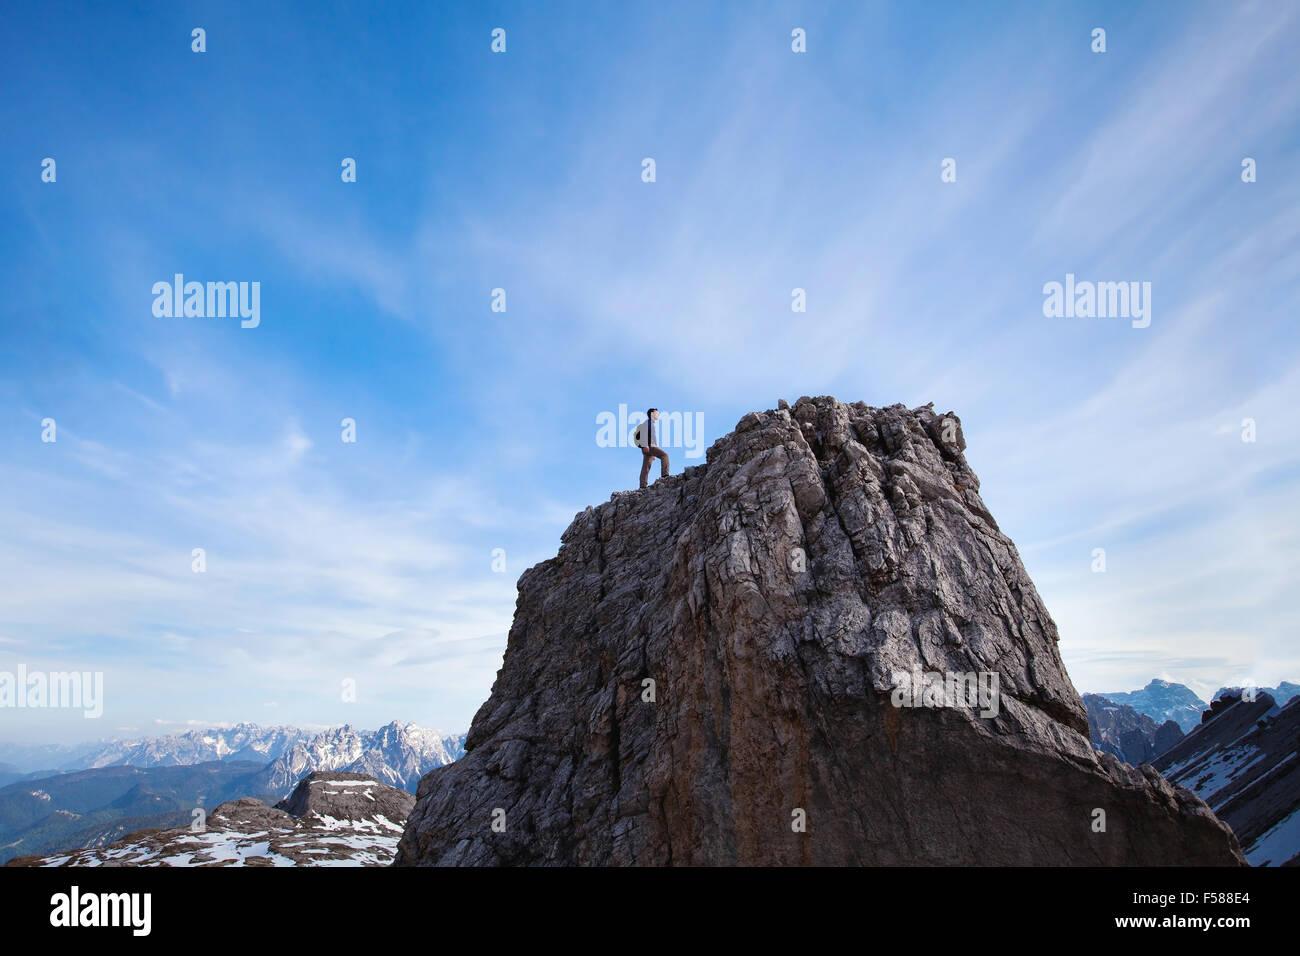 Leistung Konzept, Bergsteiger am Gipfel des Berges Stockbild